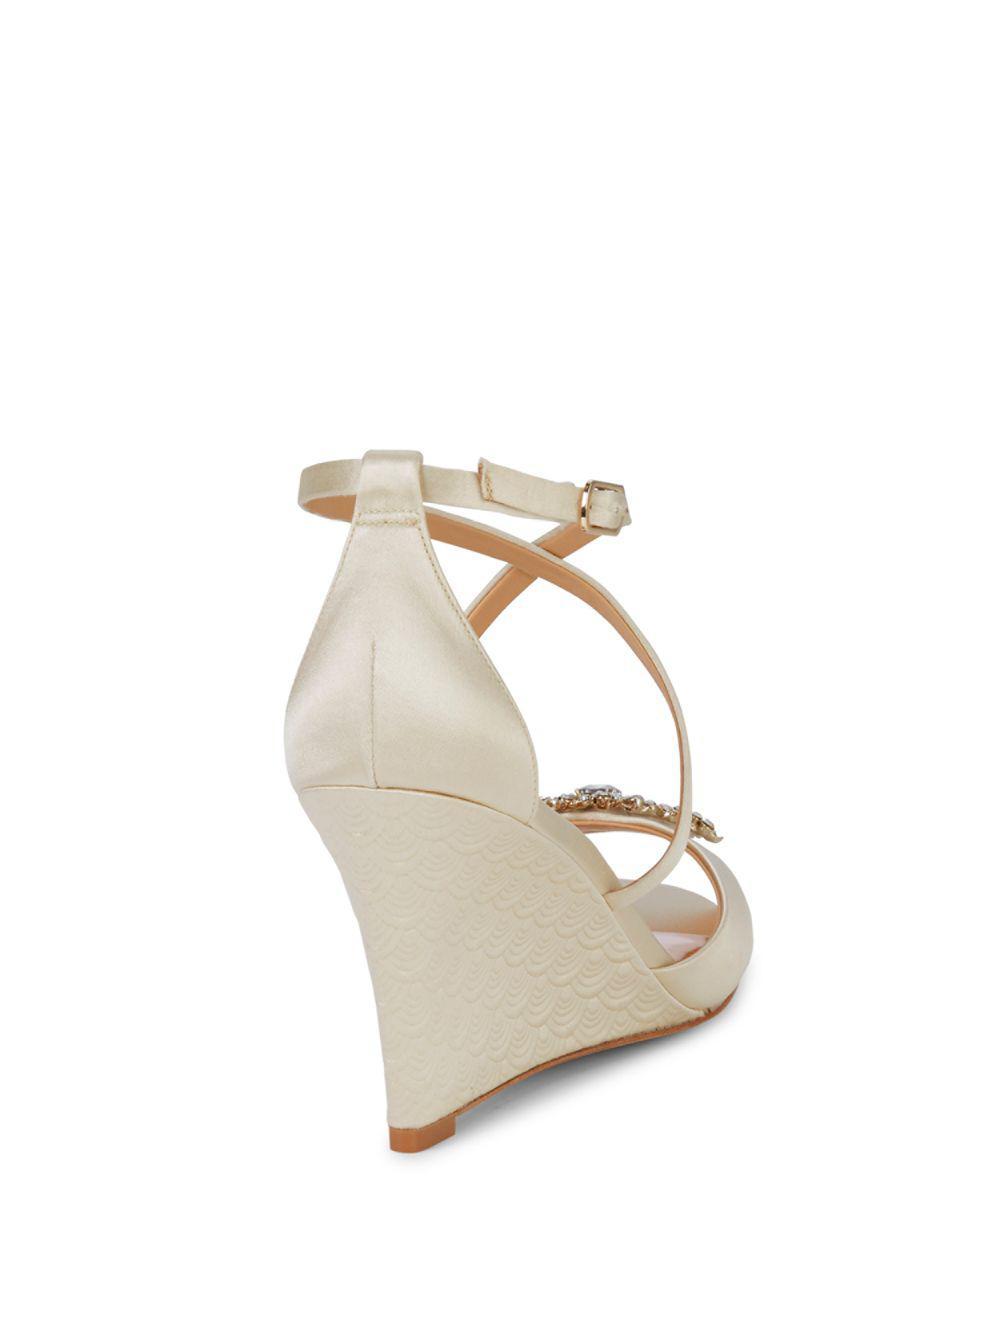 58a171500f1 Badgley Mischka Abigail Evening Sandals in White - Save 42.35668789808917%  - Lyst